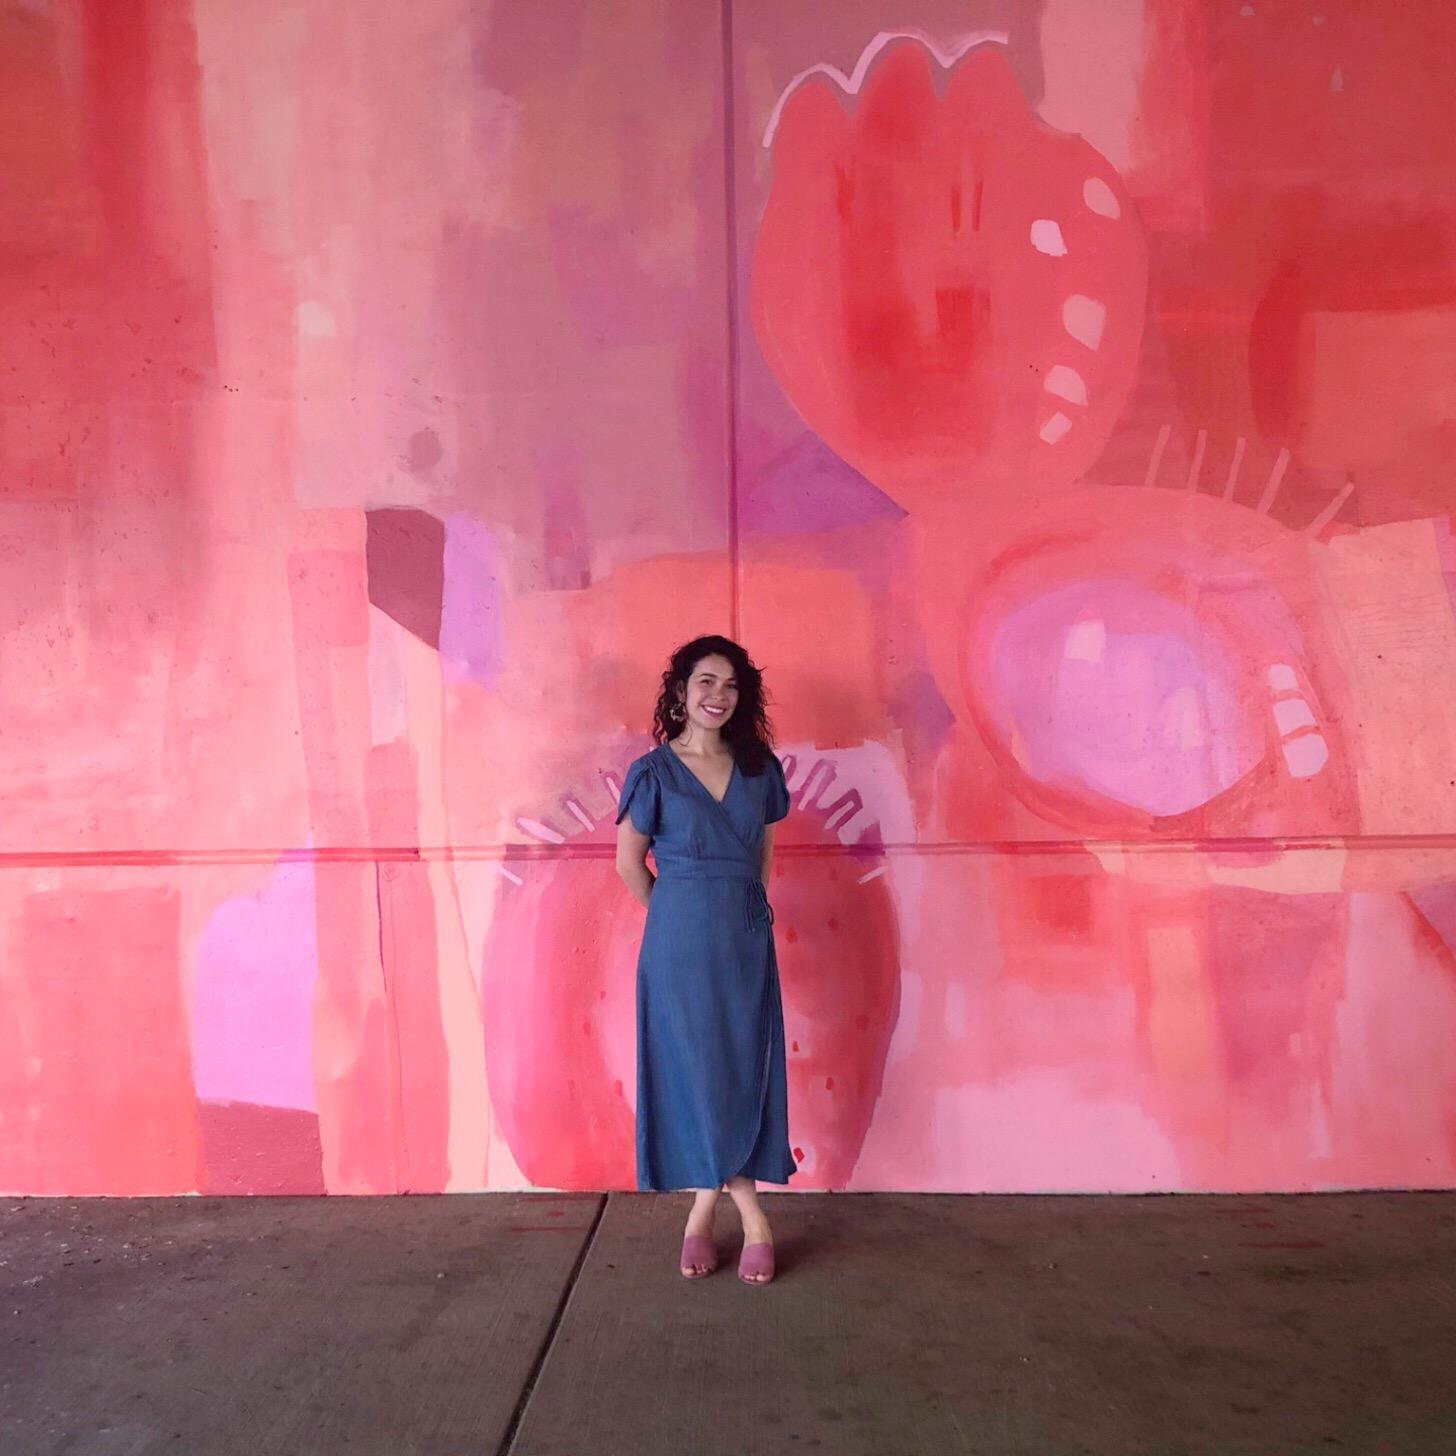 2019 ARTpath artist Mia Serafini